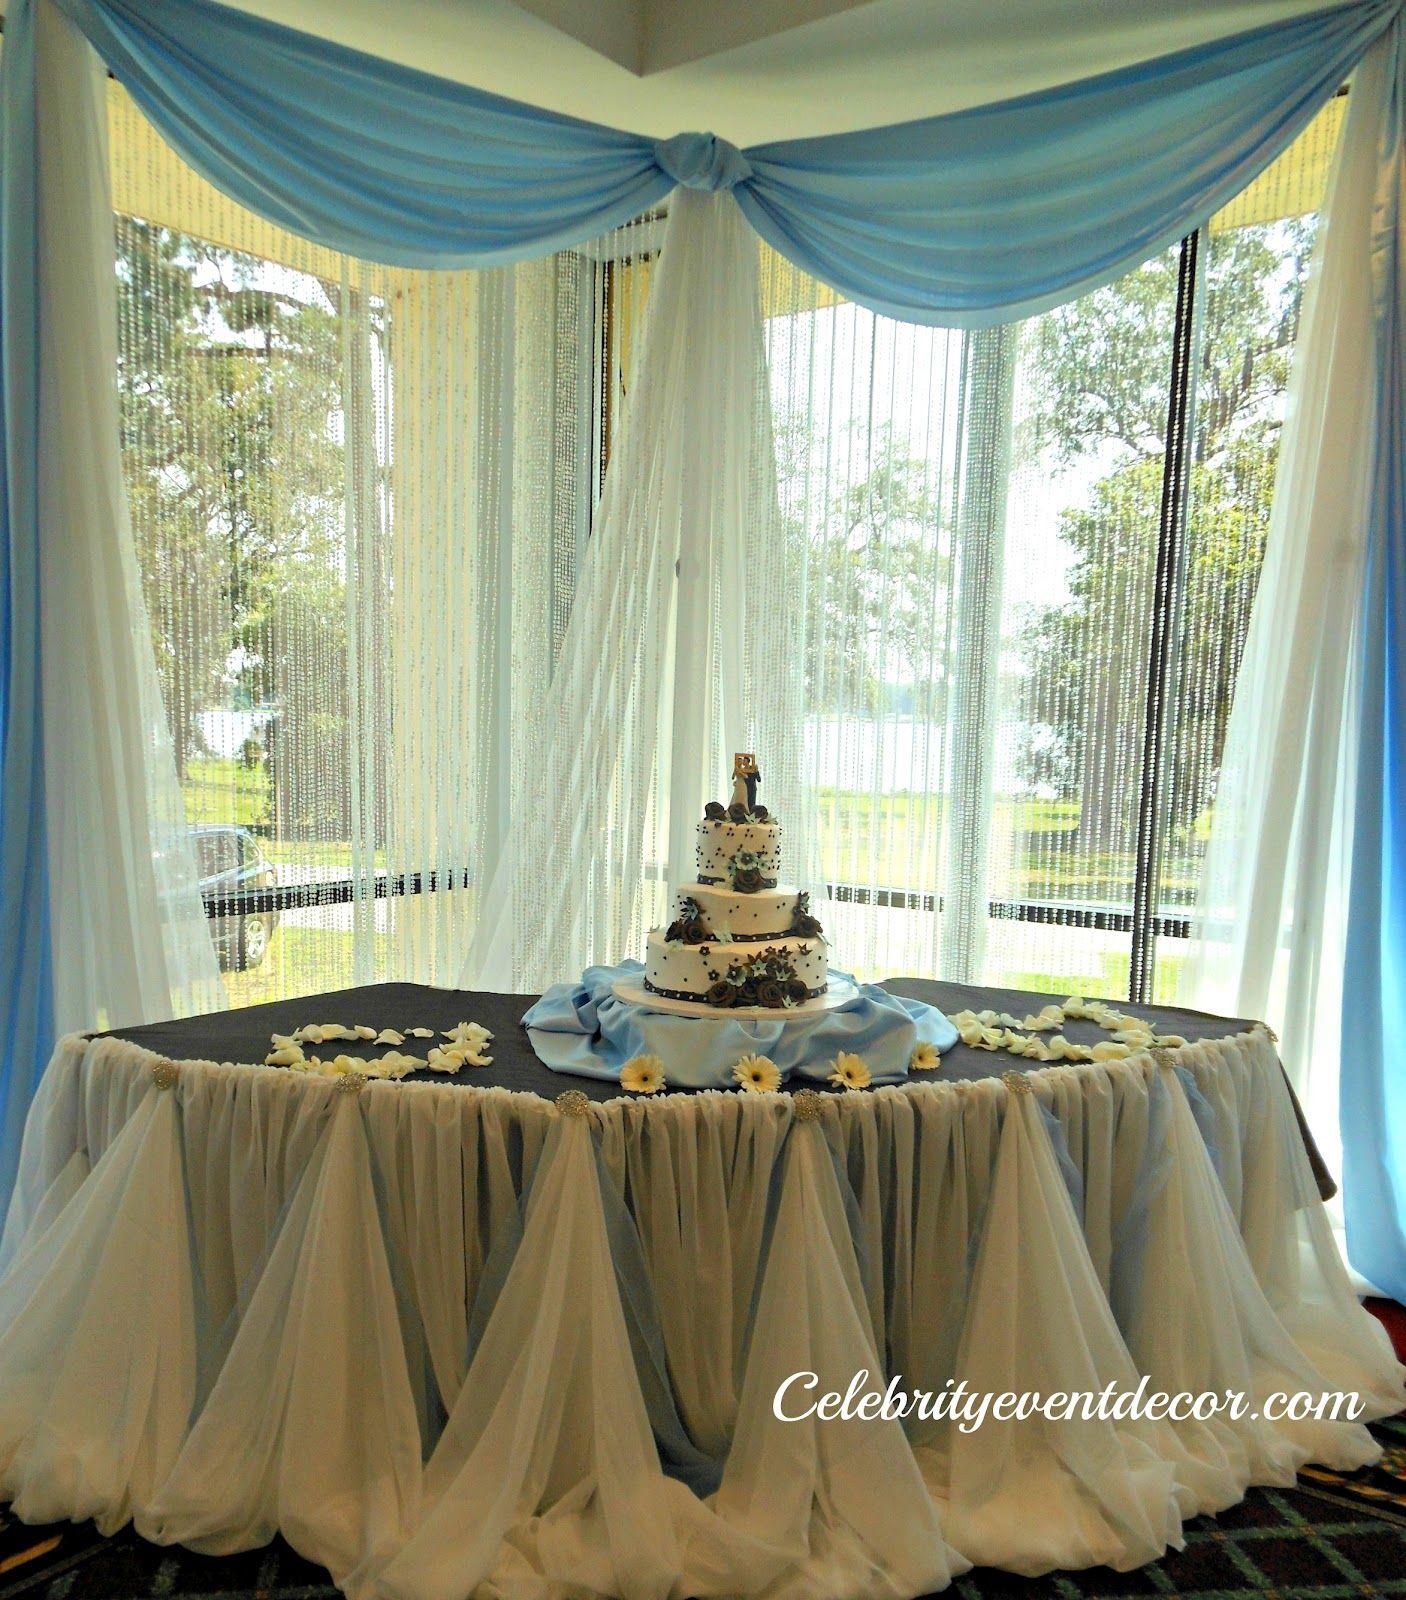 Celebrity Wedding Reception Decor: Cake Table Decorations, Cake